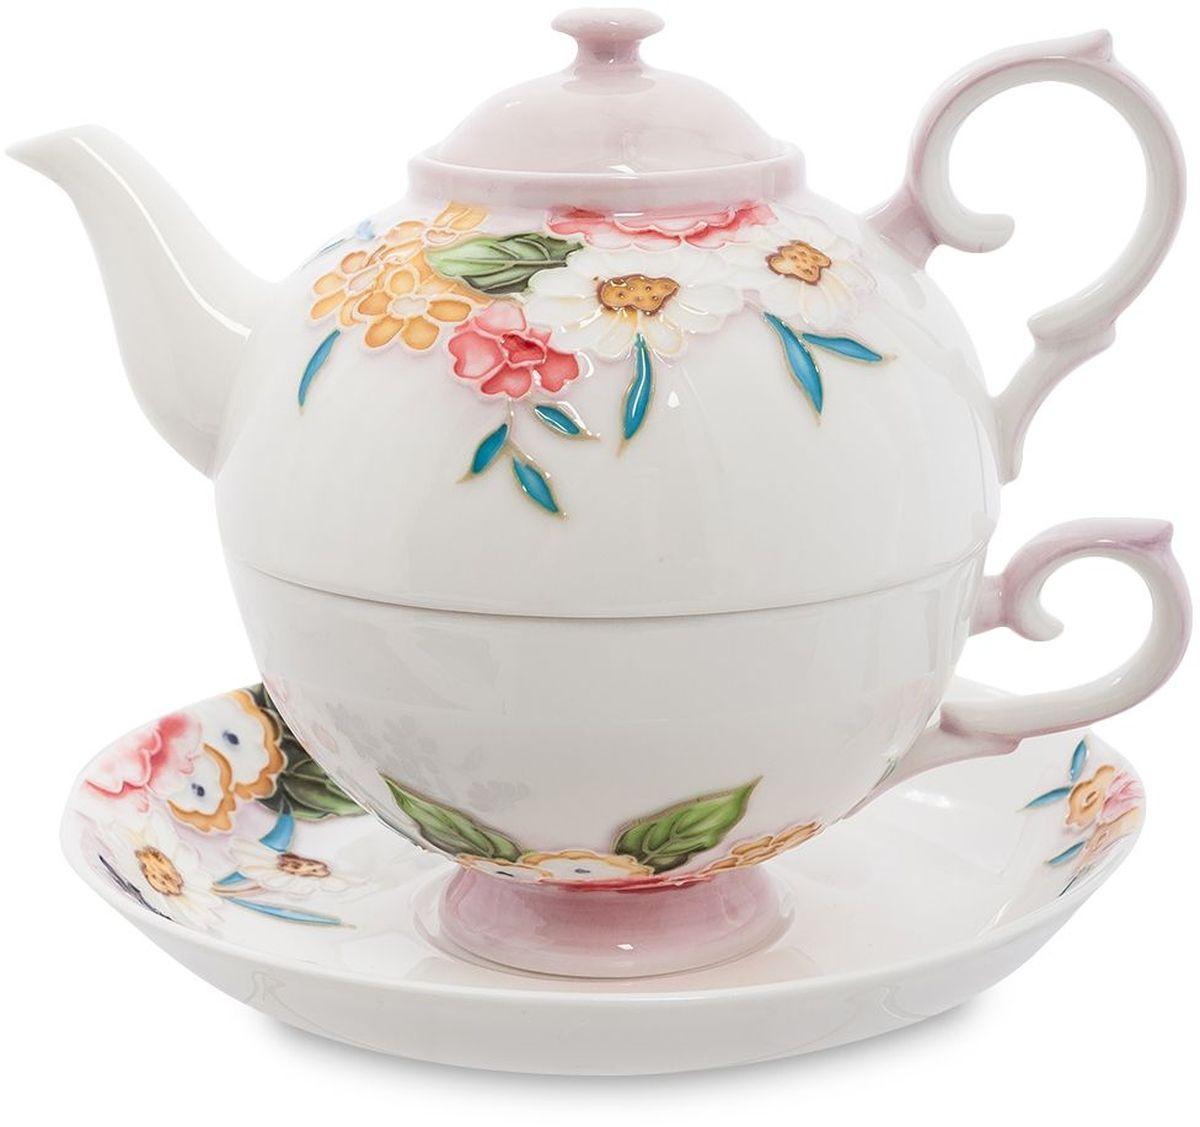 Набор чайный Pavone Королева Камилла, 3 предмета. 451592451592Объем чайника: 400 мл Объем чаши: 250 мл Диаметр блюдца: 15 см